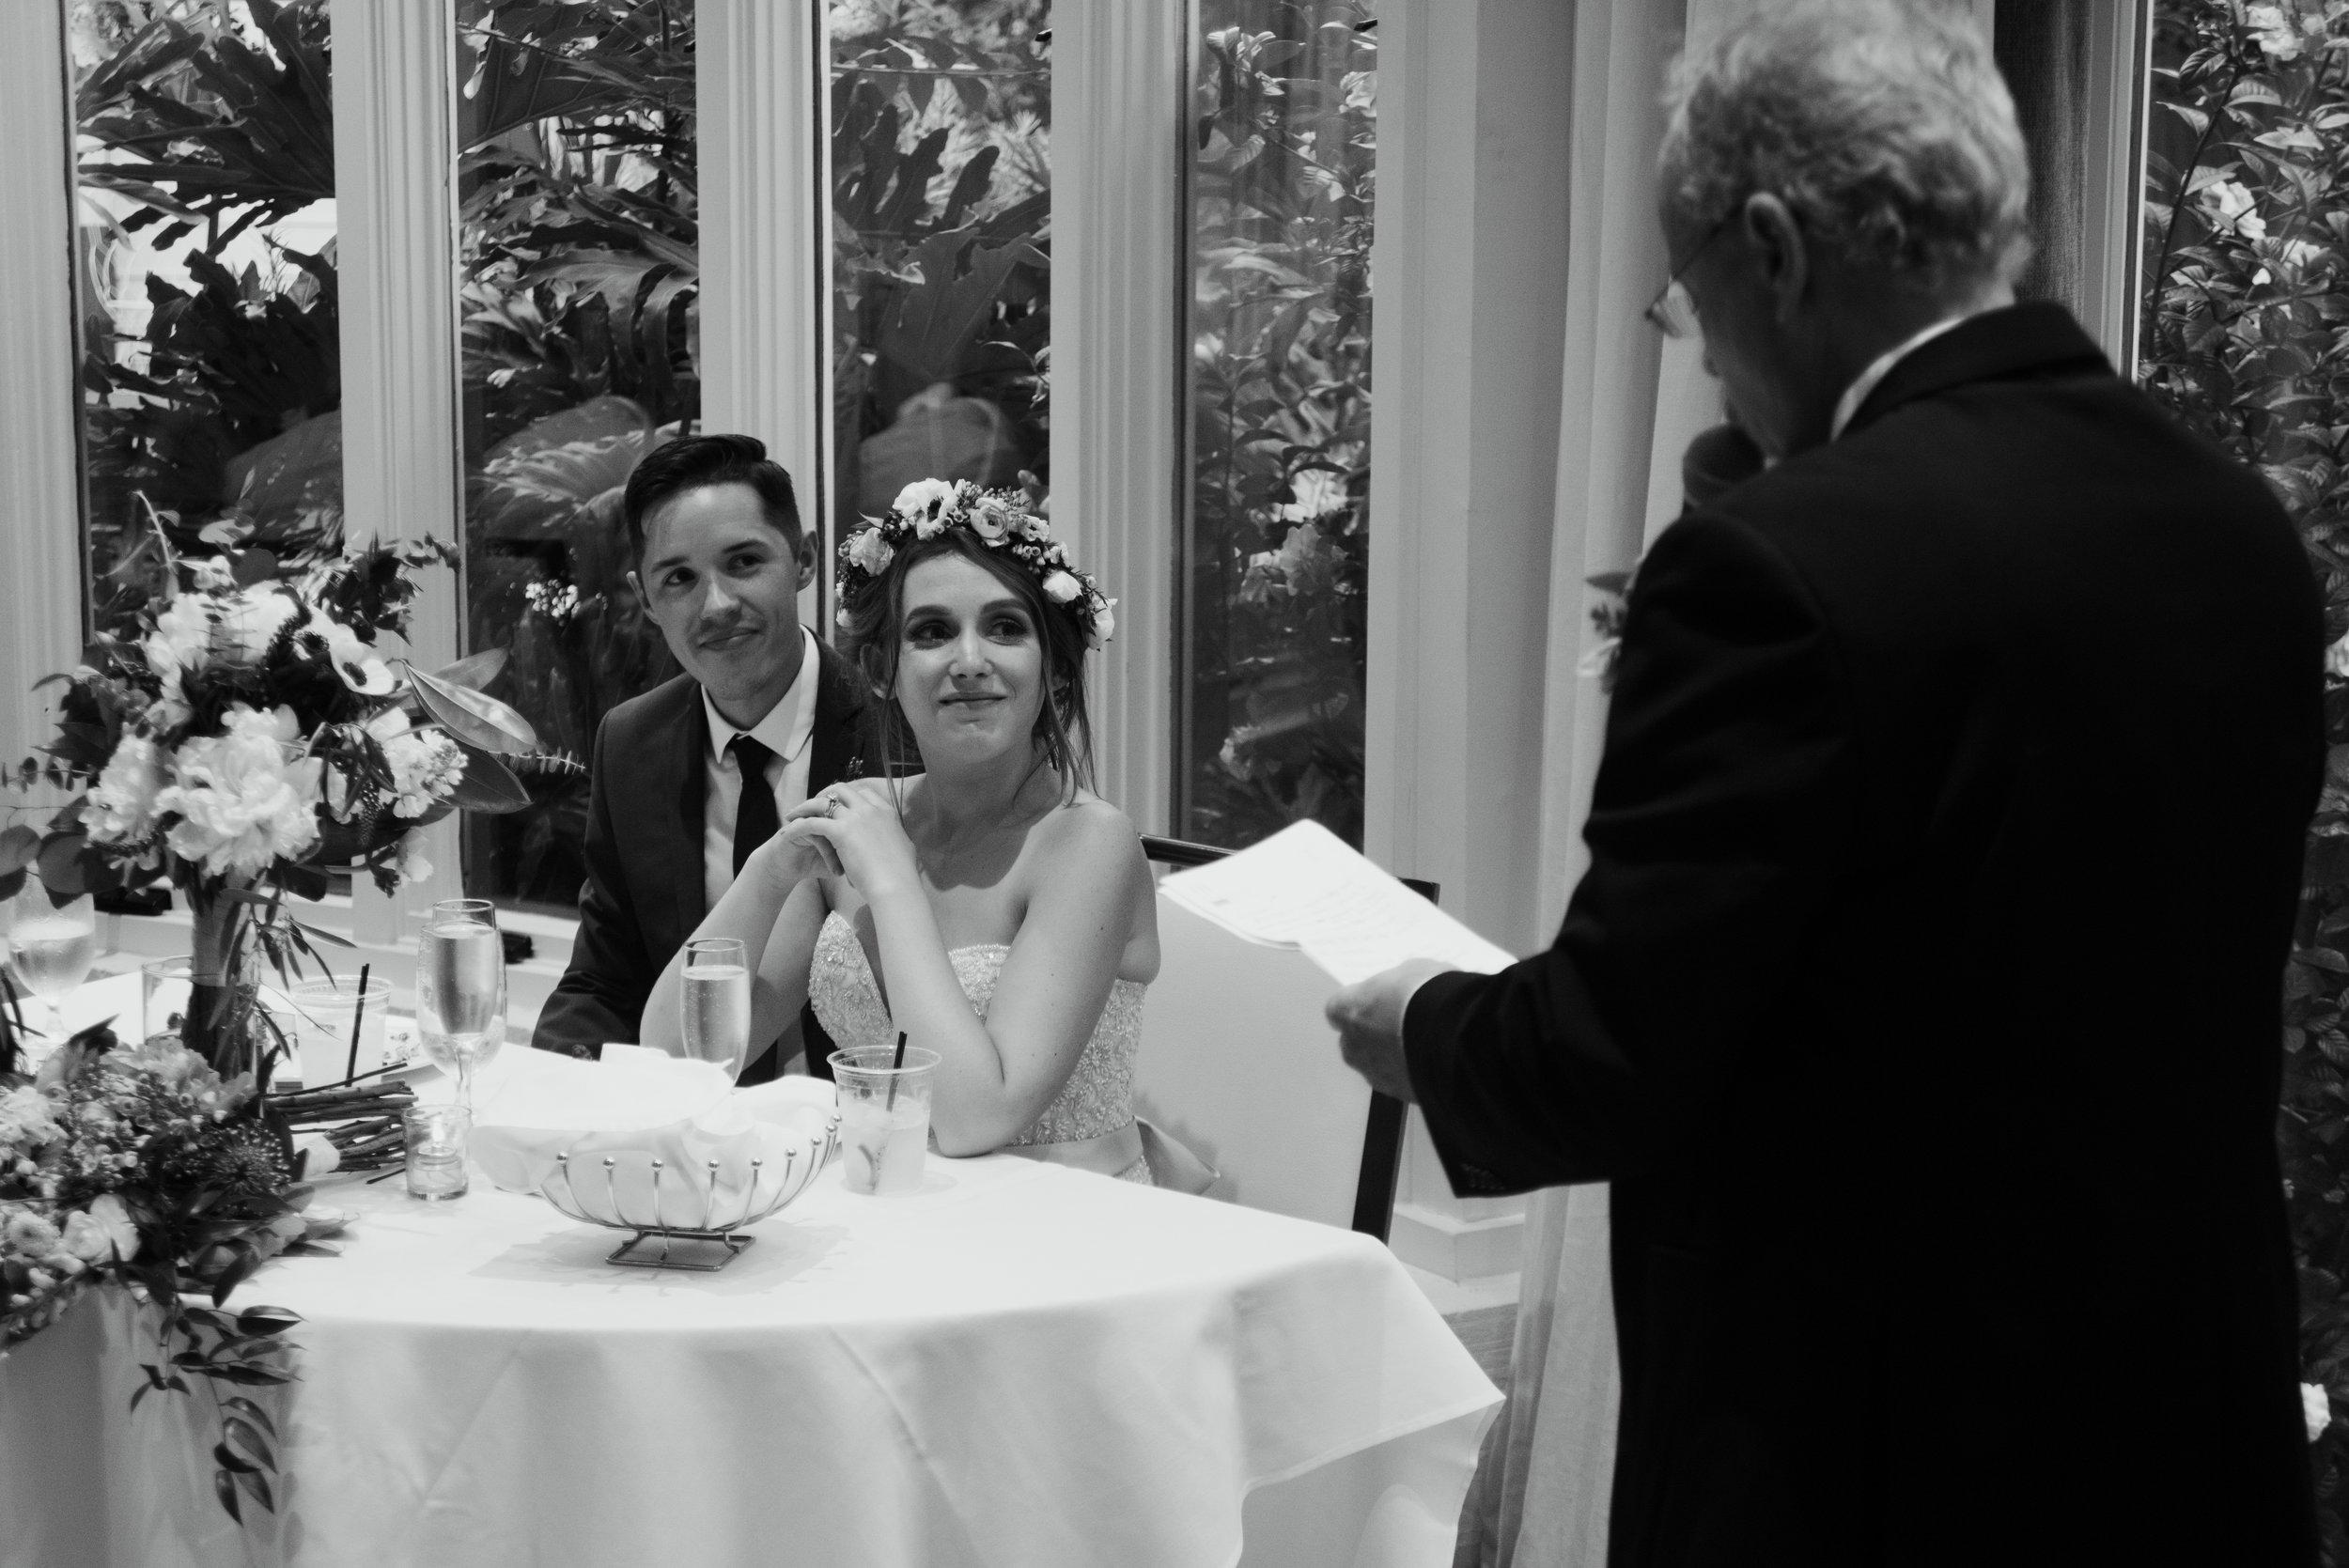 savannah-station-elopement-photographer-savannah-elopement-photography-savannah-georgia-elopement-photographer-savannah-wedding-photographer-meg-hill-photo-jade-hill- (84 of 93).jpg